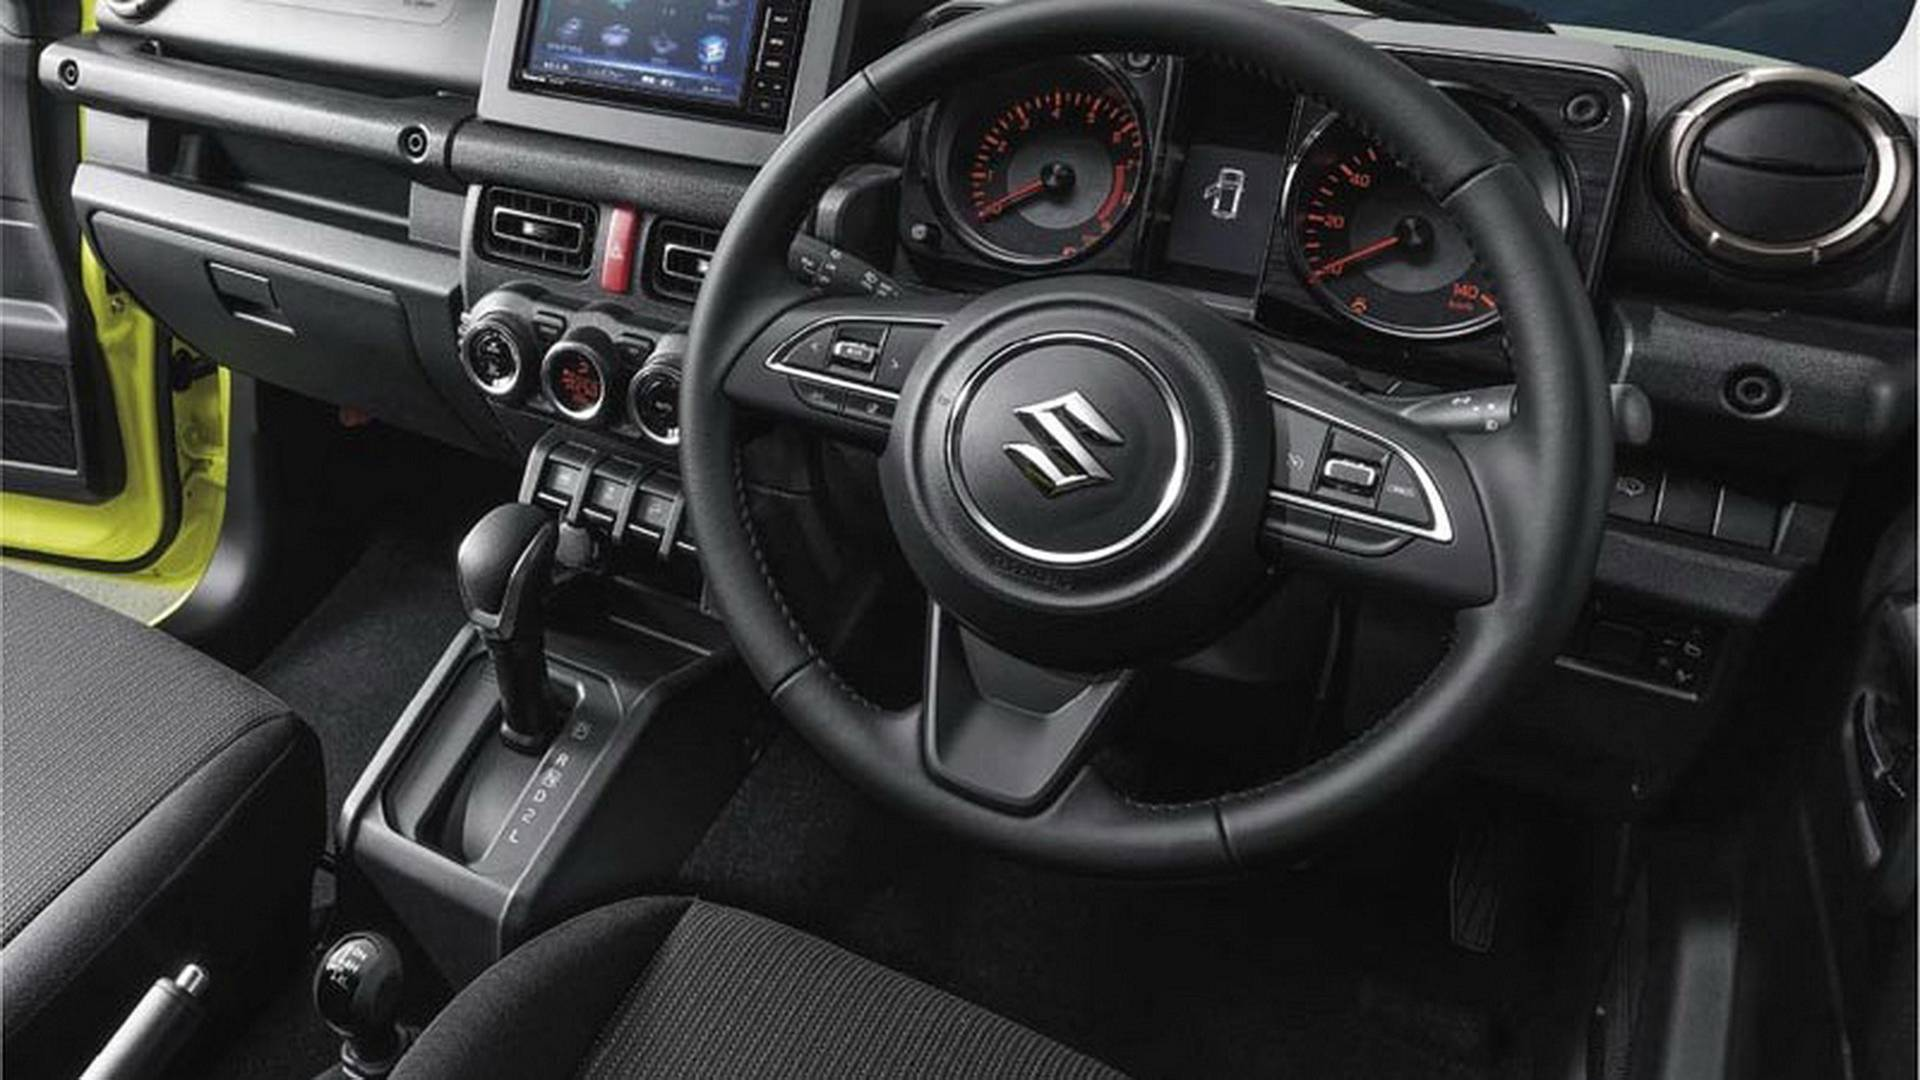 2018 Suzuki Jimny Convertible Masterfully Rendered - autoevolution